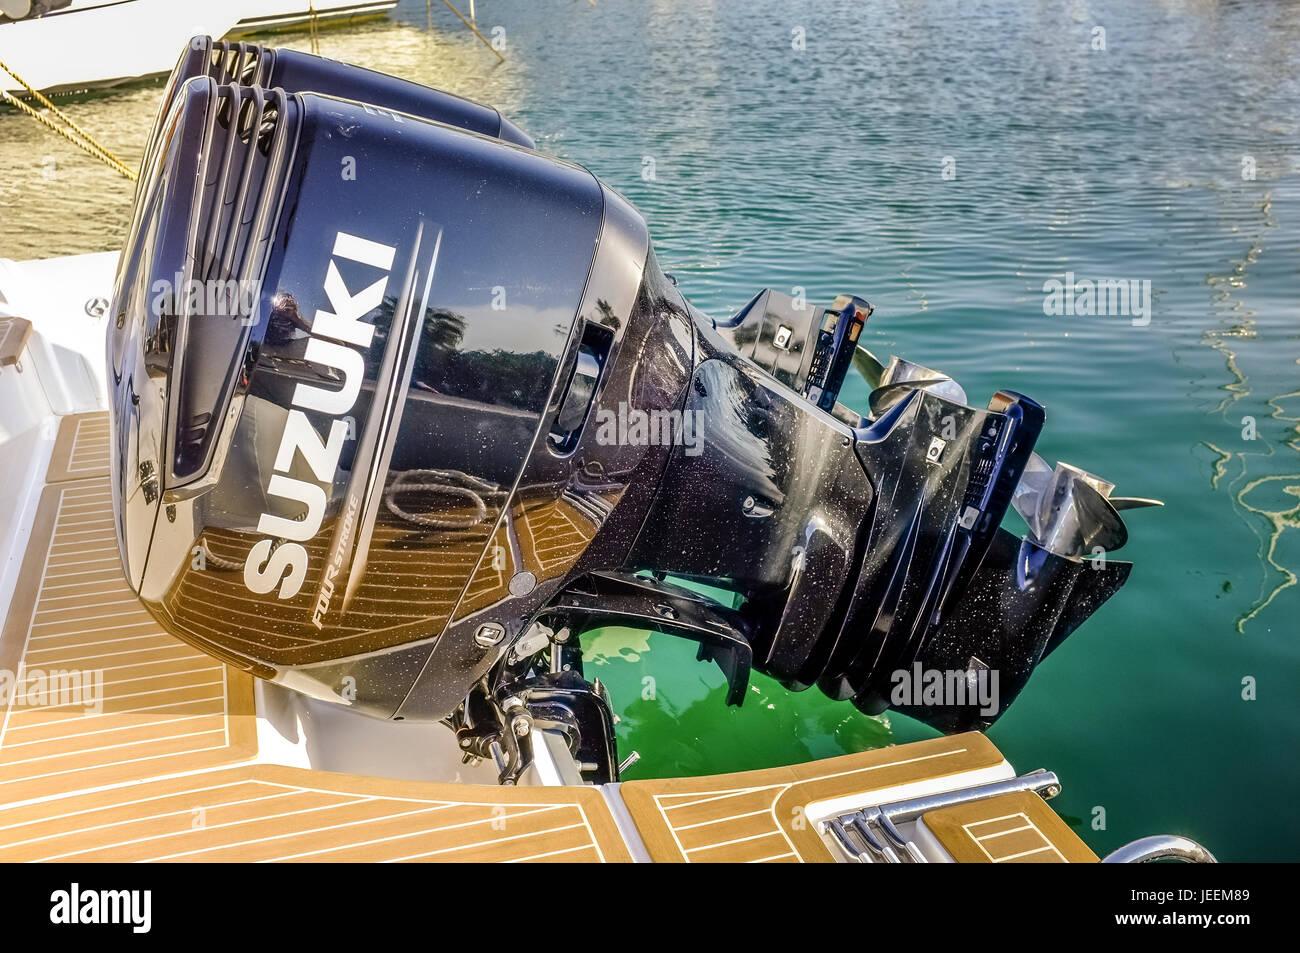 Twin Suzuki outboard motors - Stock Image